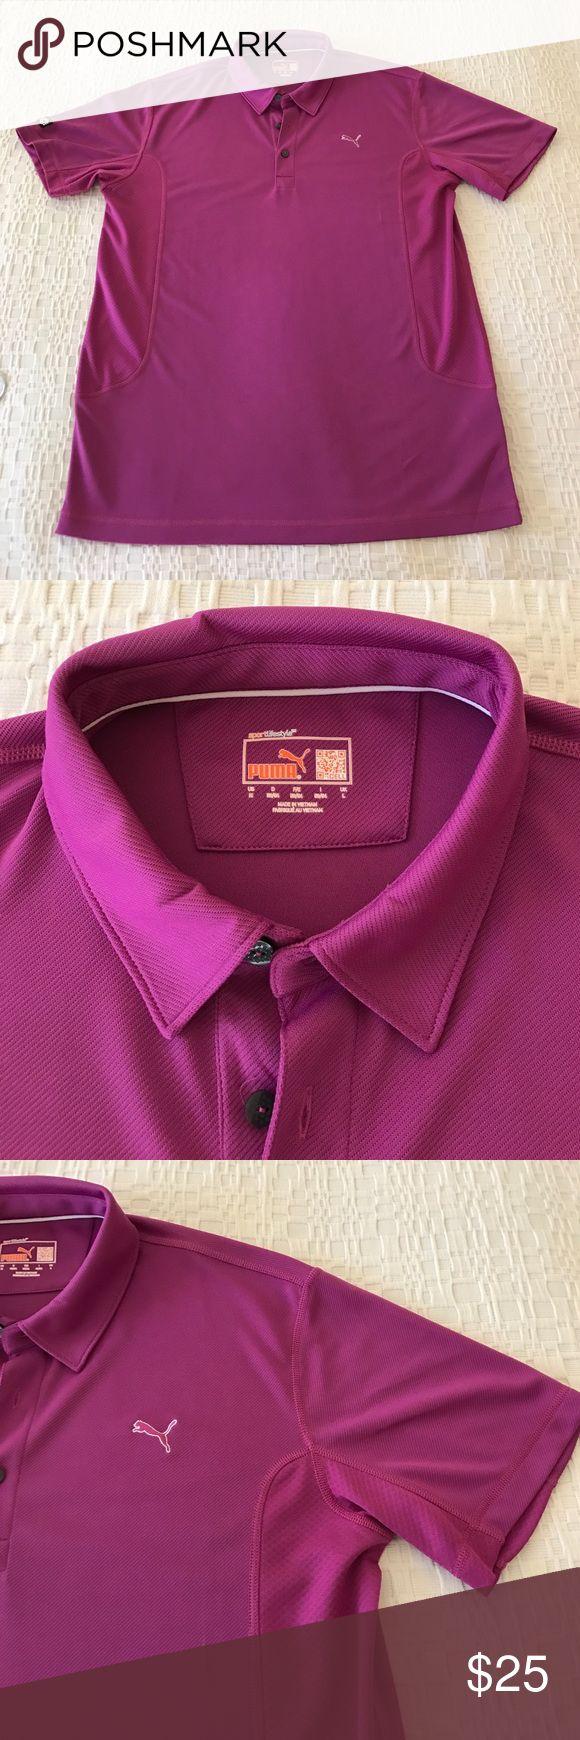 Men's Puma sport style purple golf shirt. Puma Golf collared purple shirt. Short sleeves. Moisture wicking material. Like new. Puma Shirts Polos